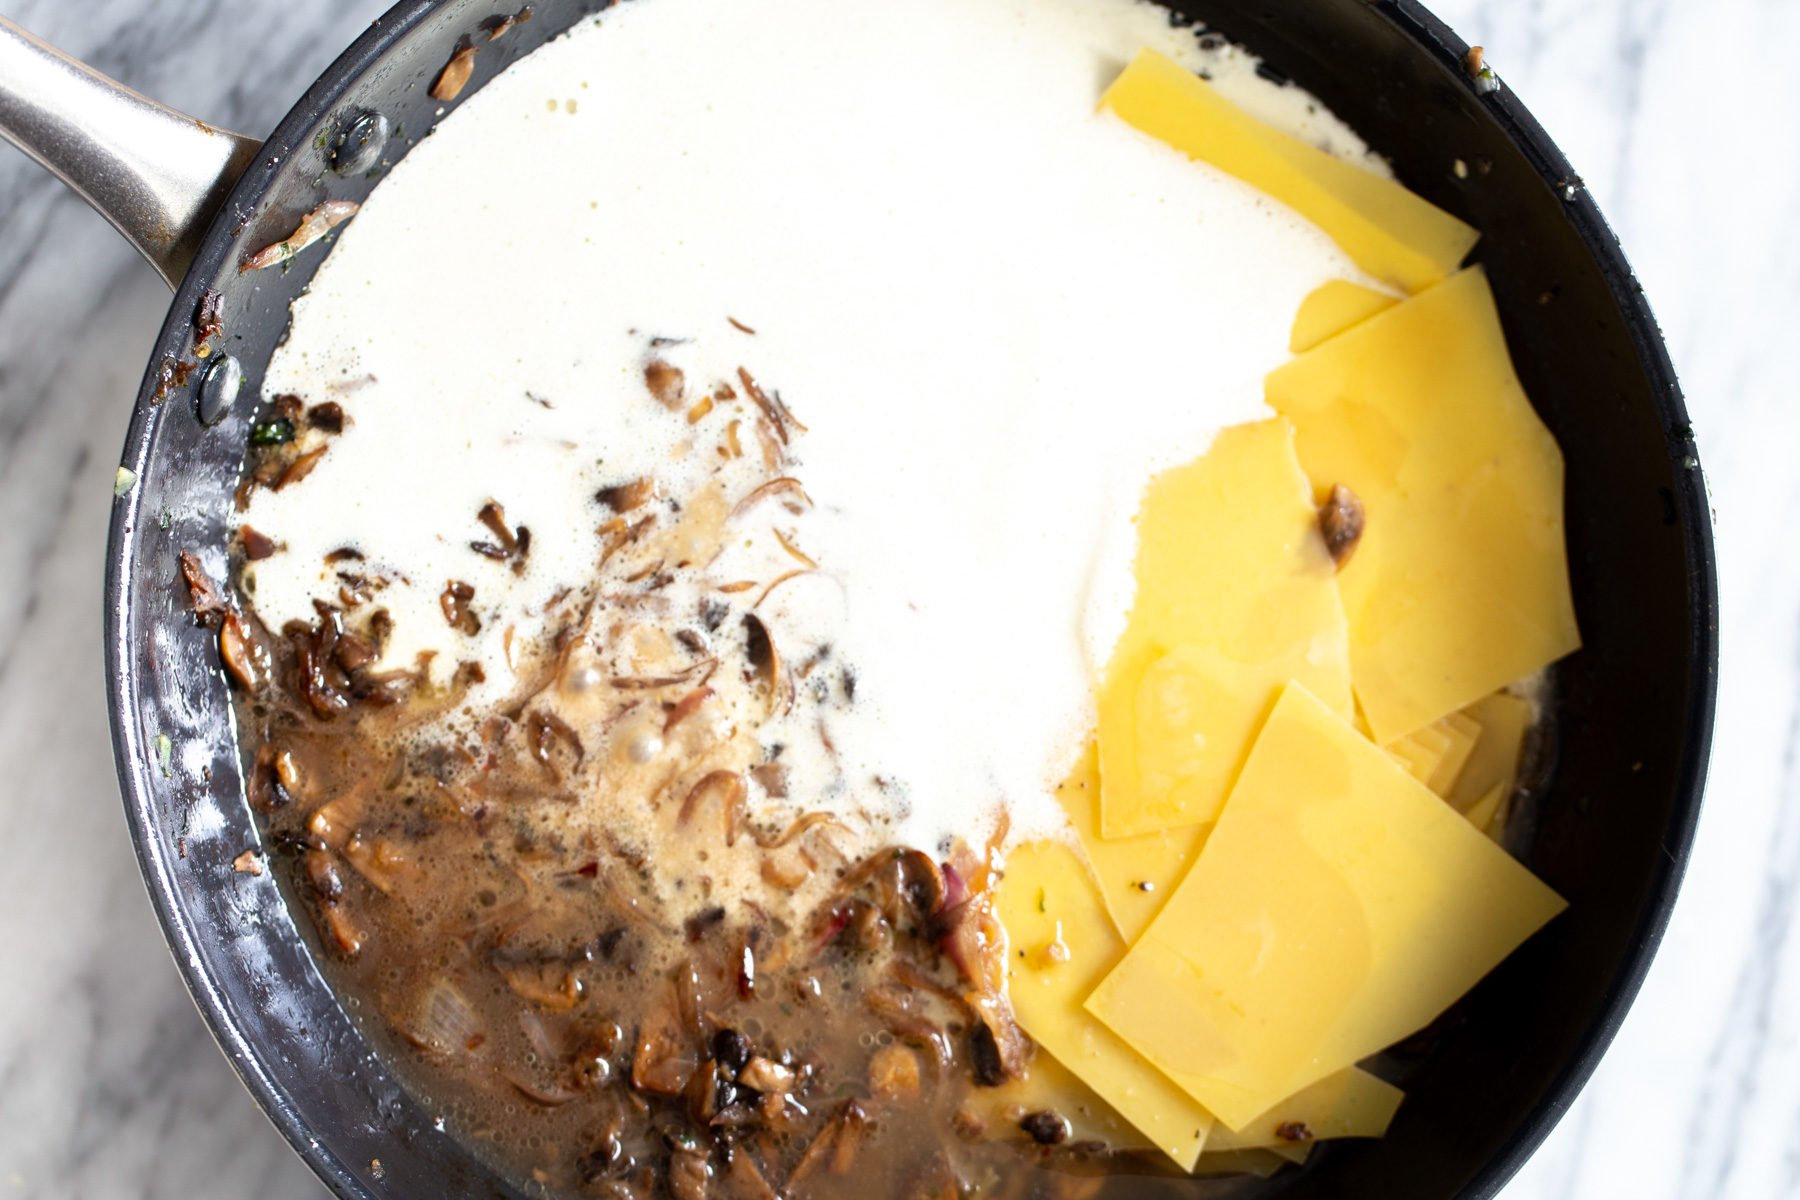 alfredo sauce and lasagna sheets being added to skillet to make skillet lasagna